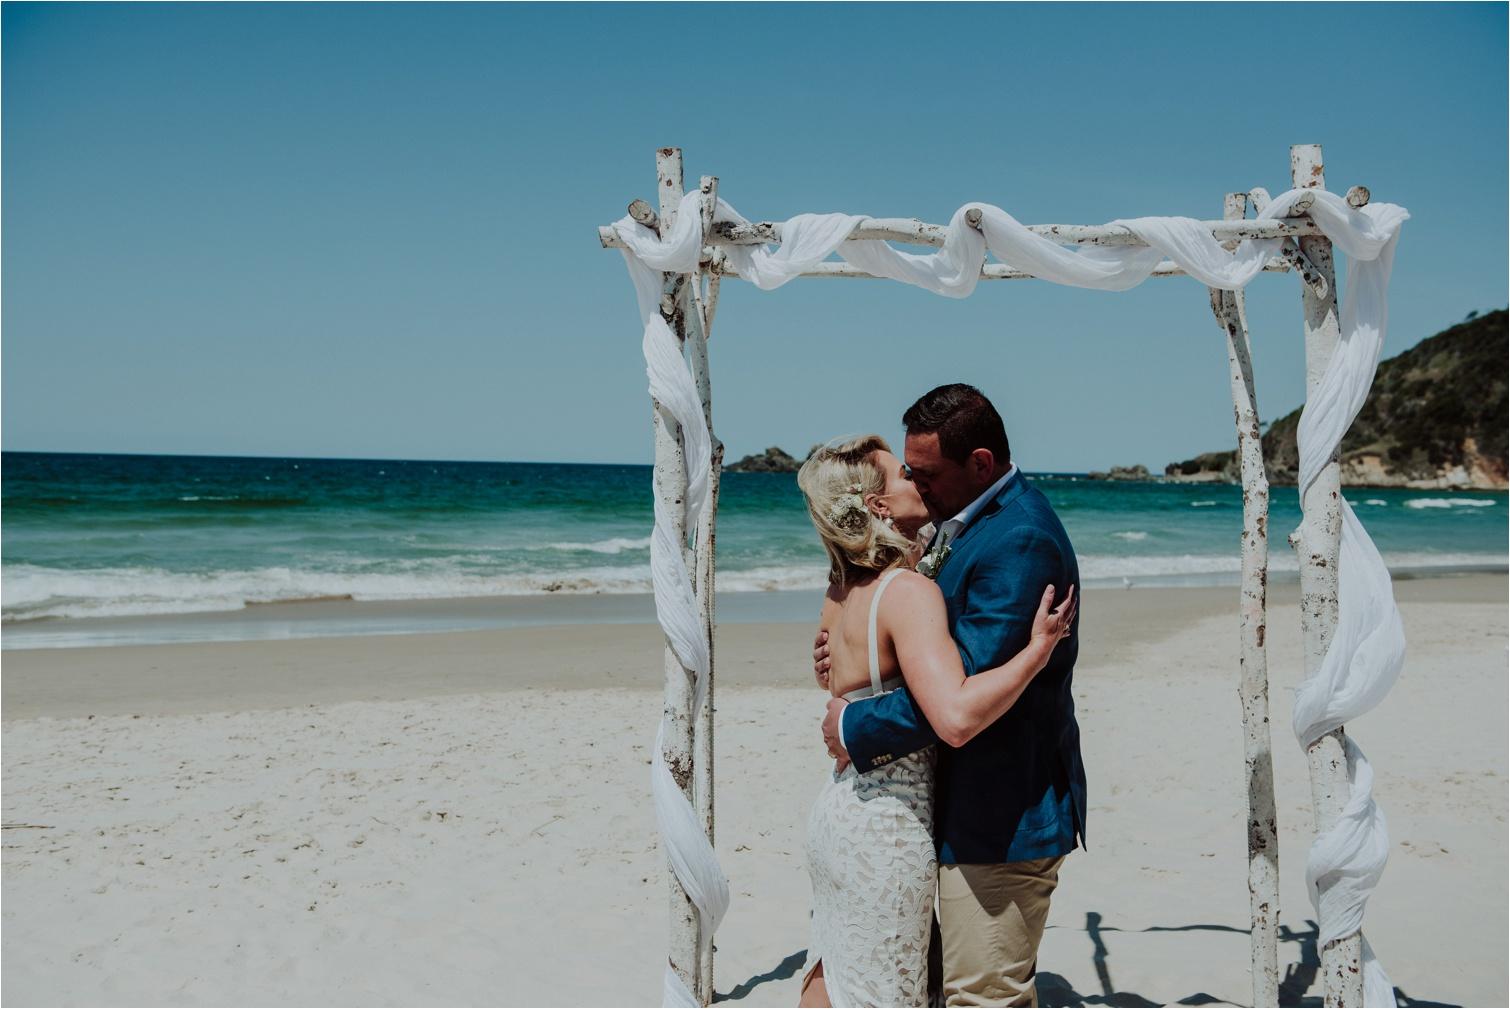 First kiss at byron bay beach wedding